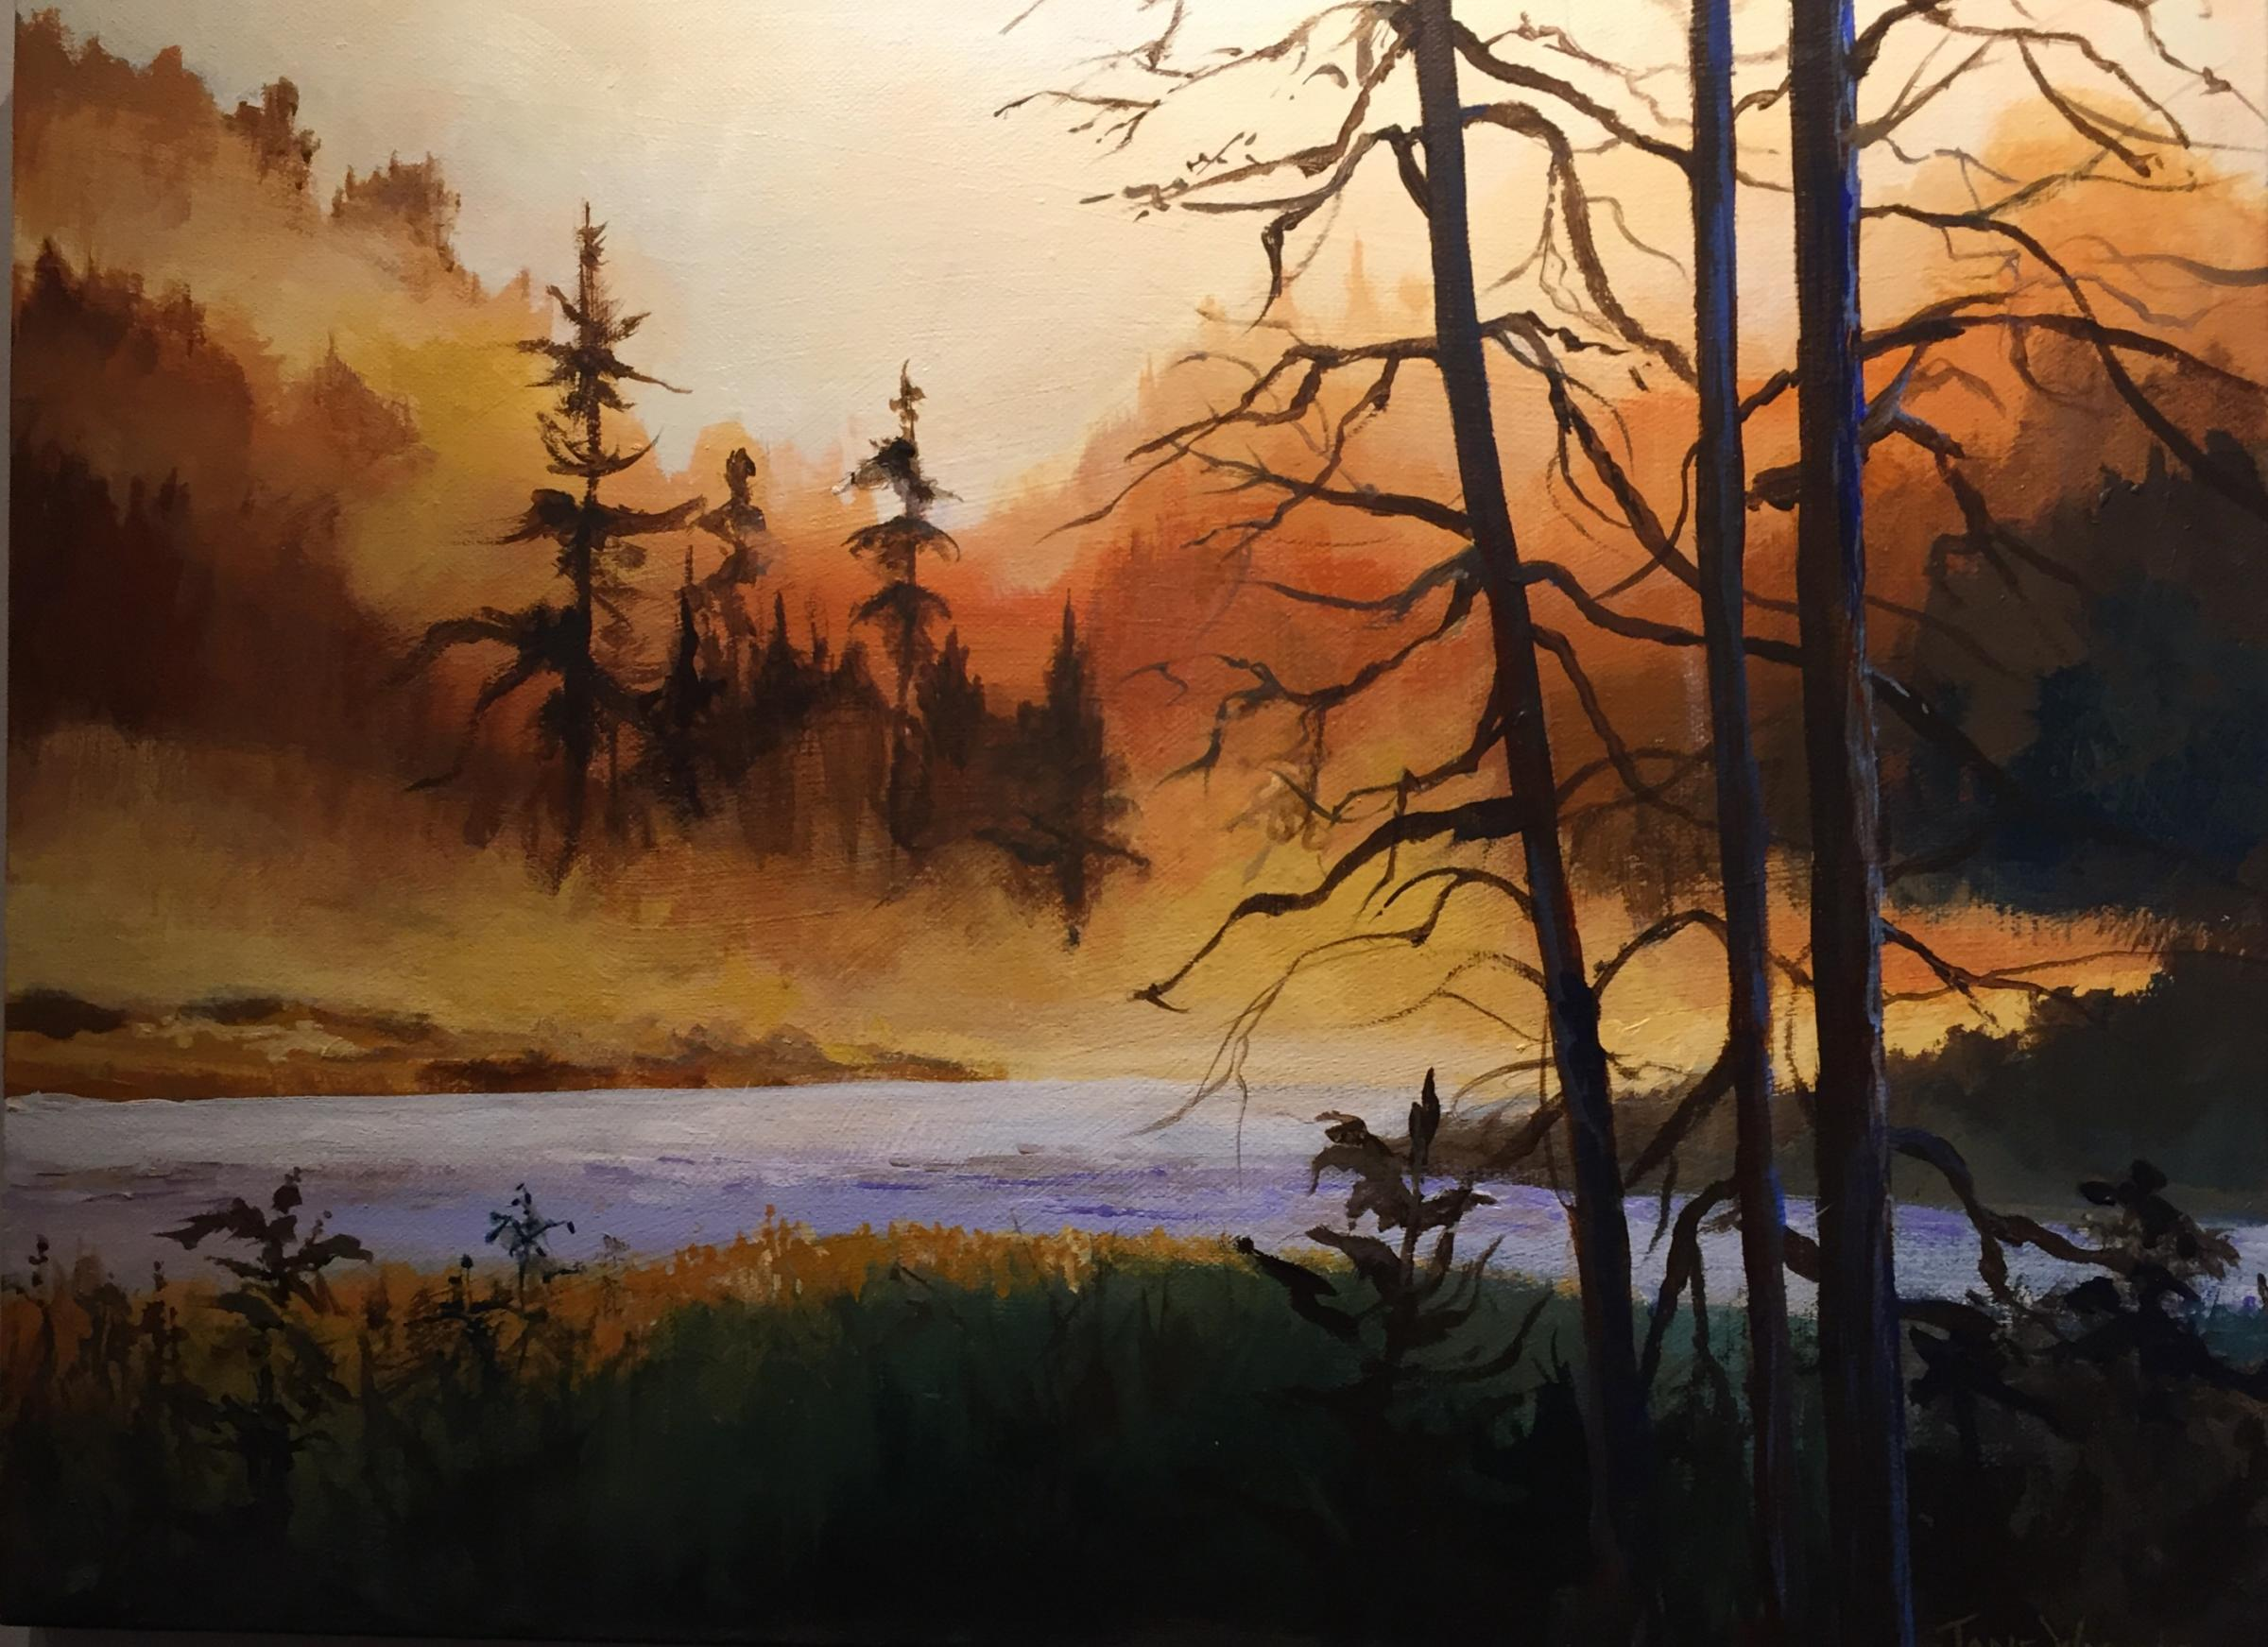 A Golden Day by Jane Wynne